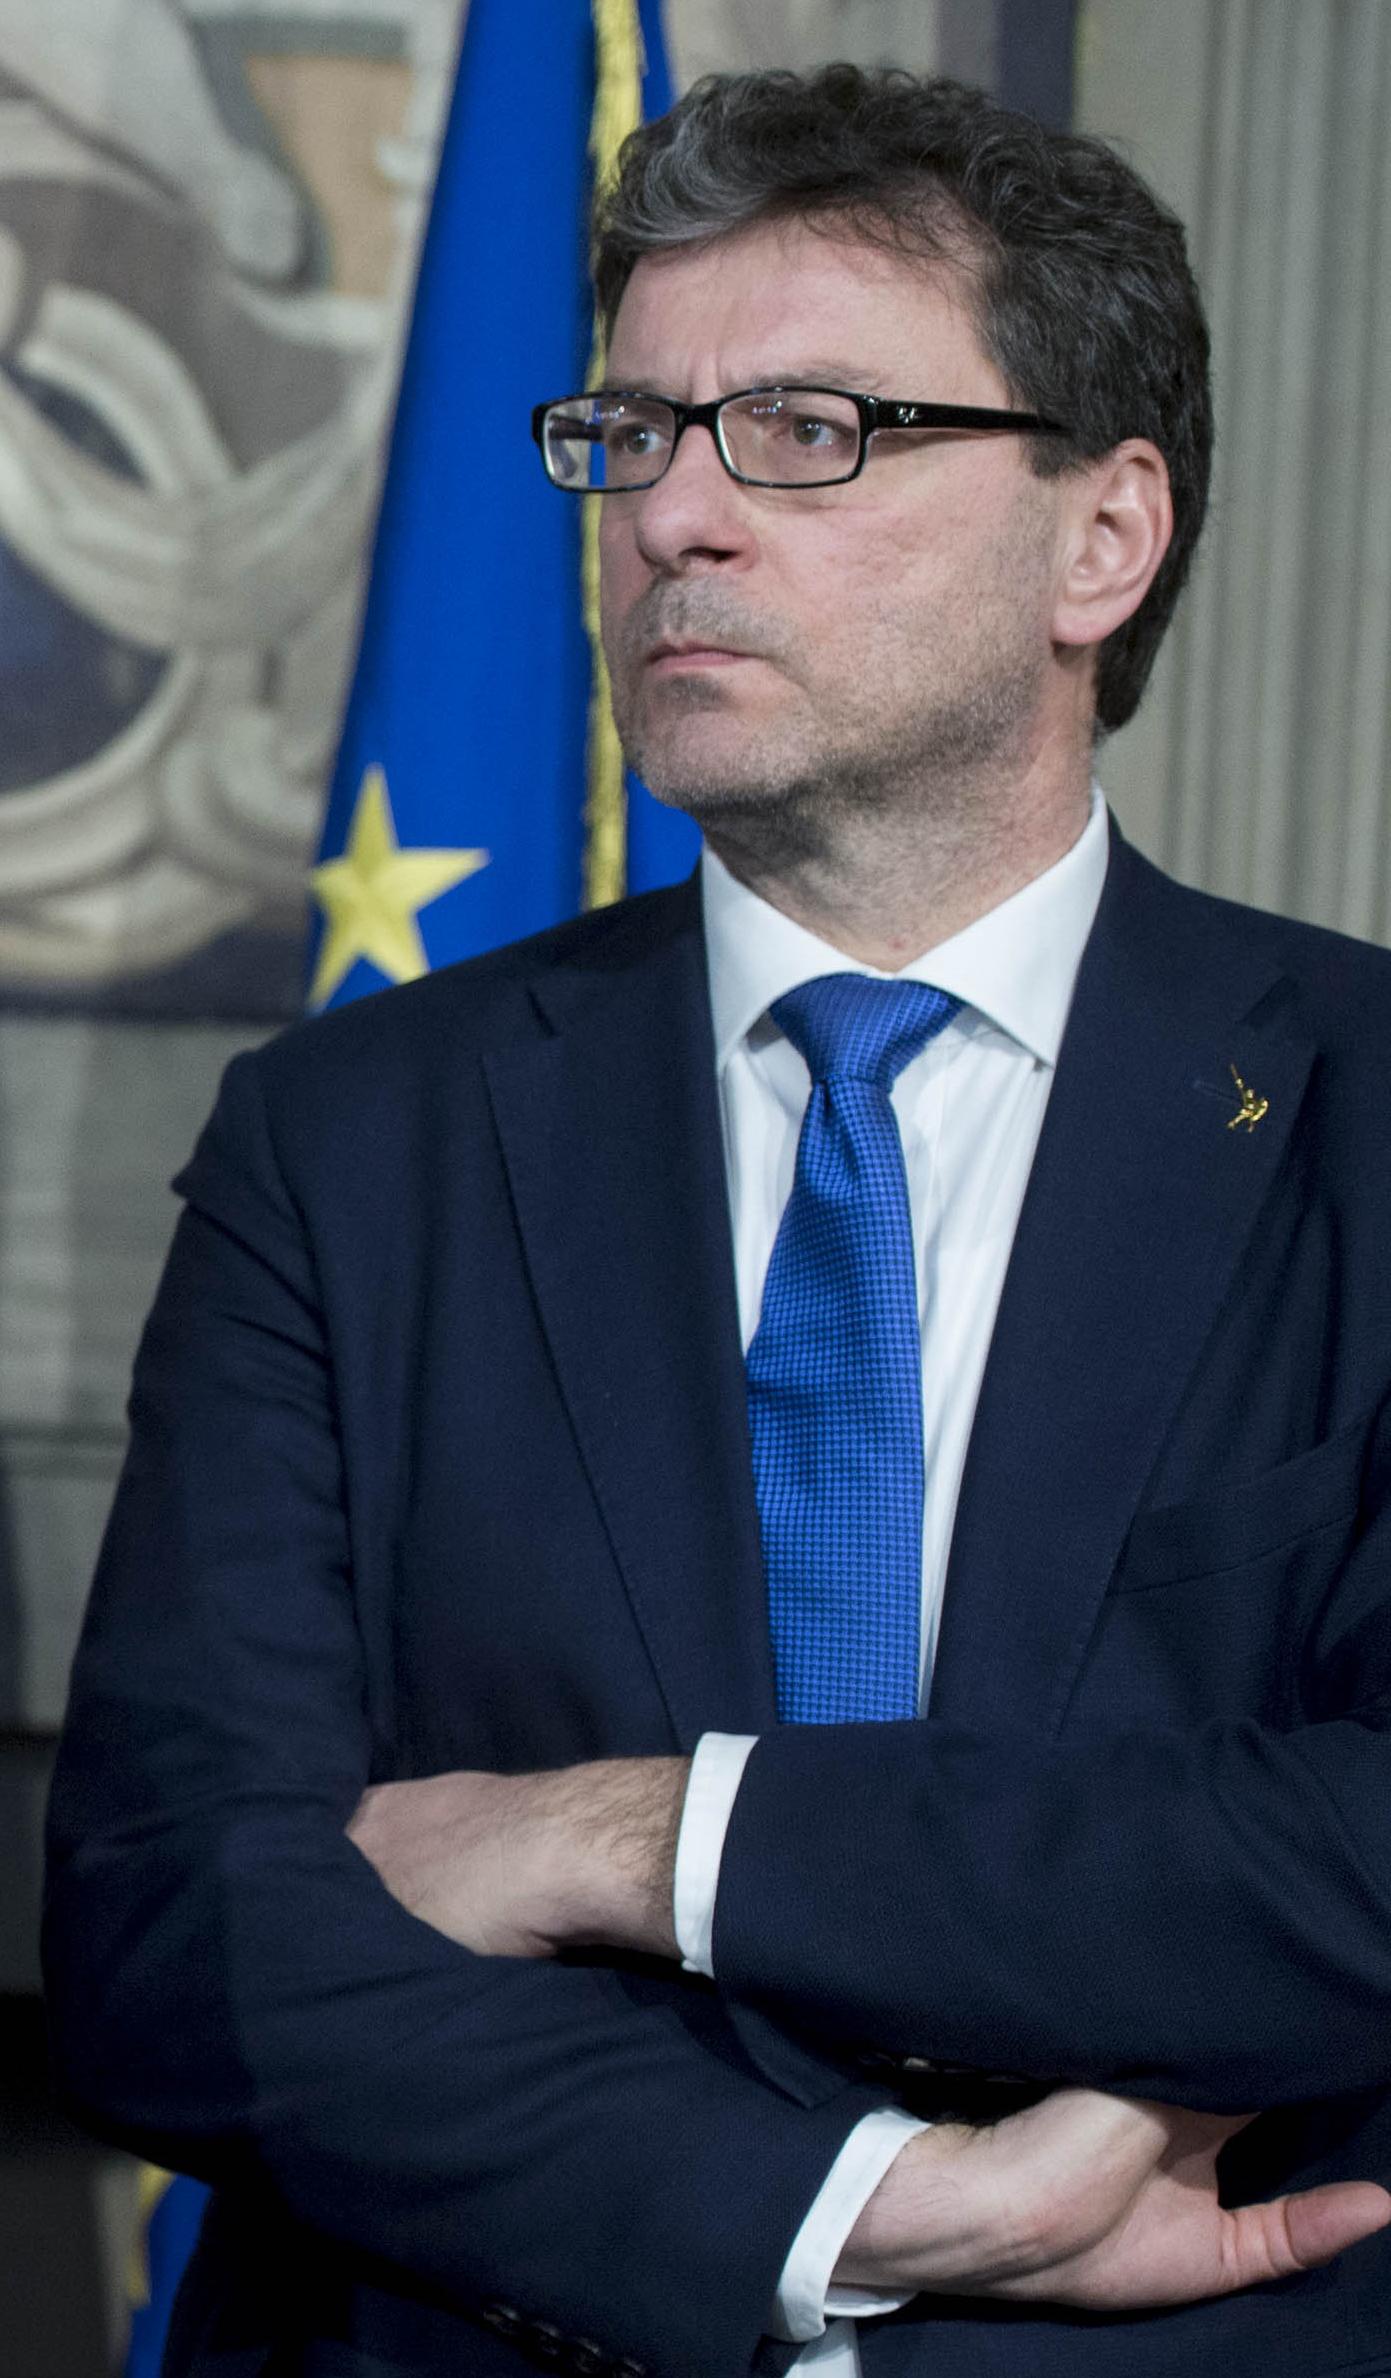 Giancarlo Giorgetti - Wikipedia